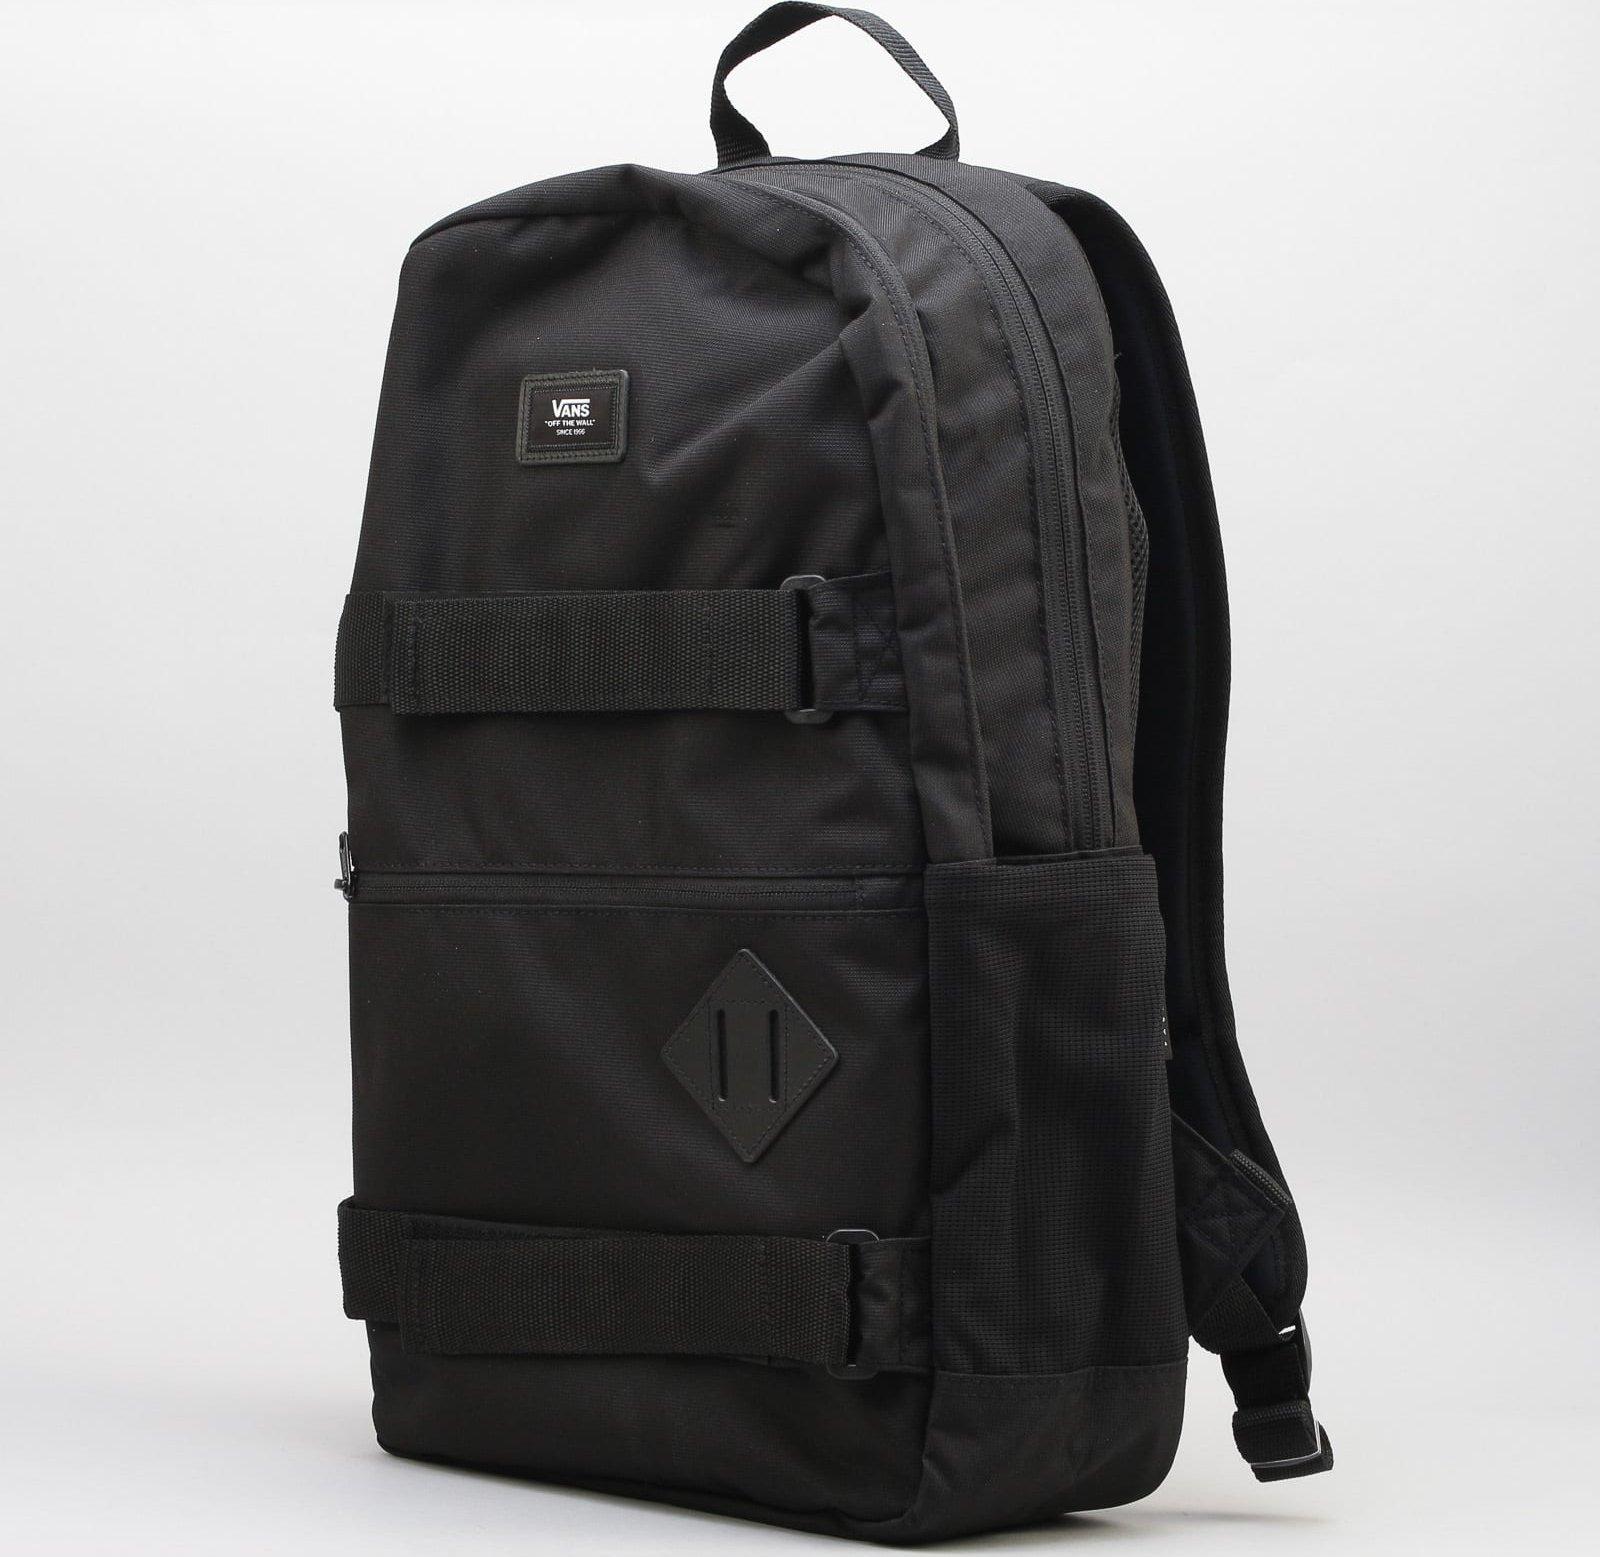 VANS Authentic III Skatepack černý od 1 450 Kč • Zboží.cz 8b6364da67